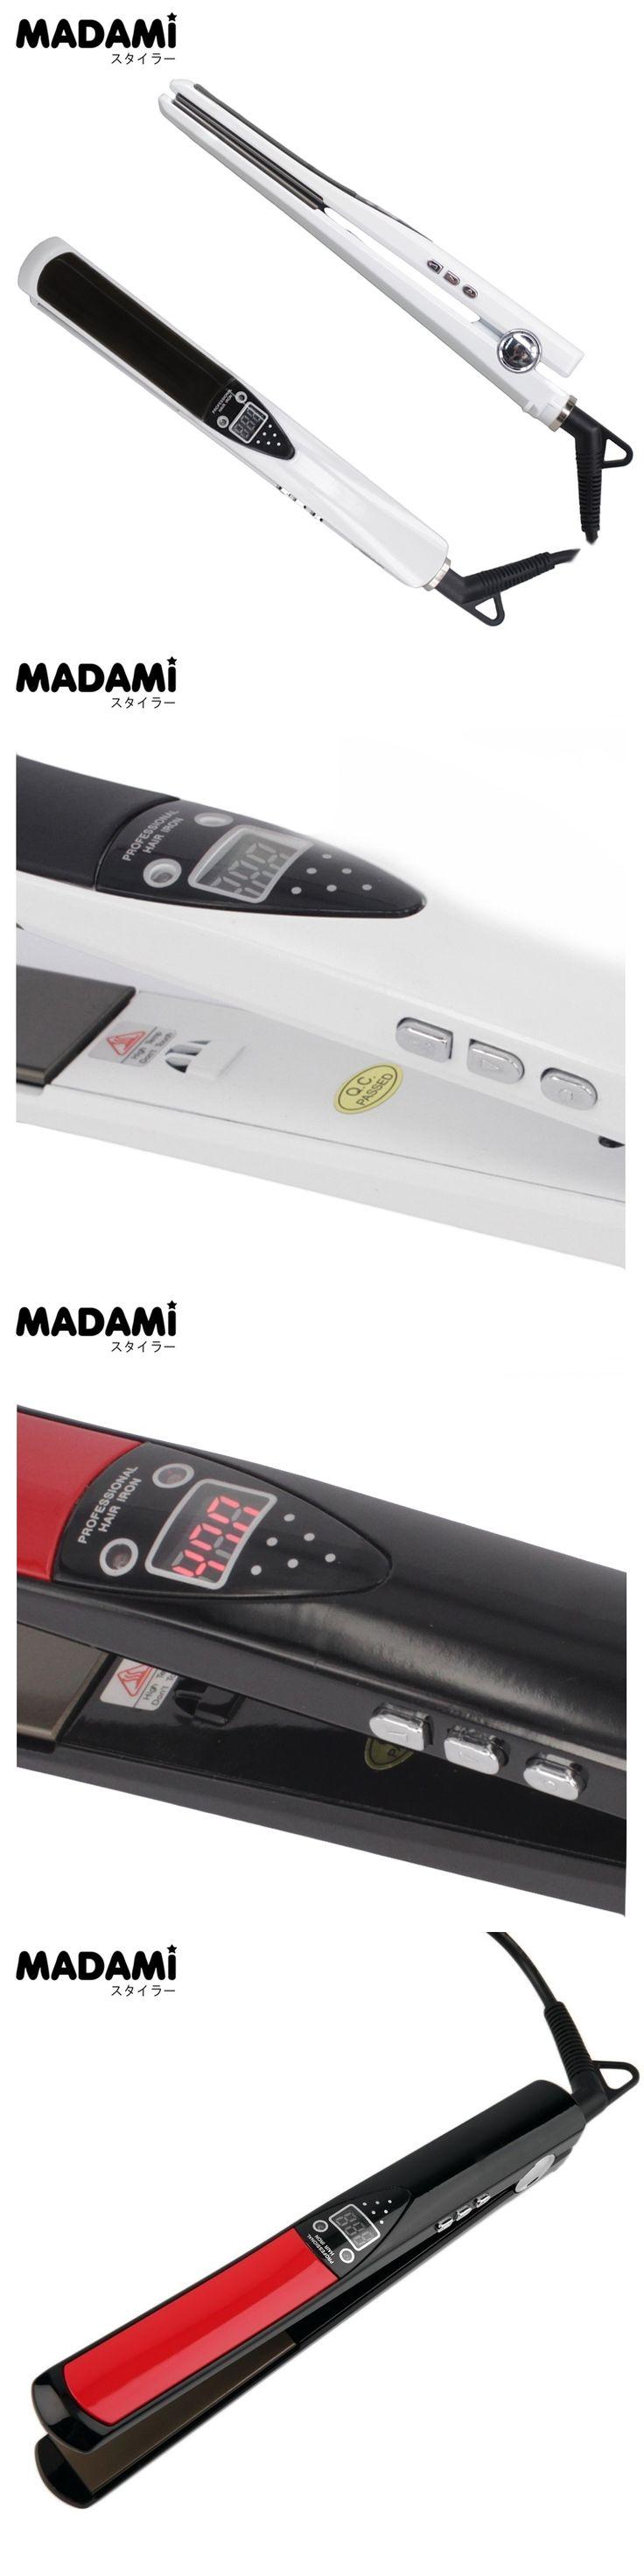 Professional Styling Tool LCD Display Titanium plates Straightening Iron MCH Hair Straightener High Temperature Fast Heating